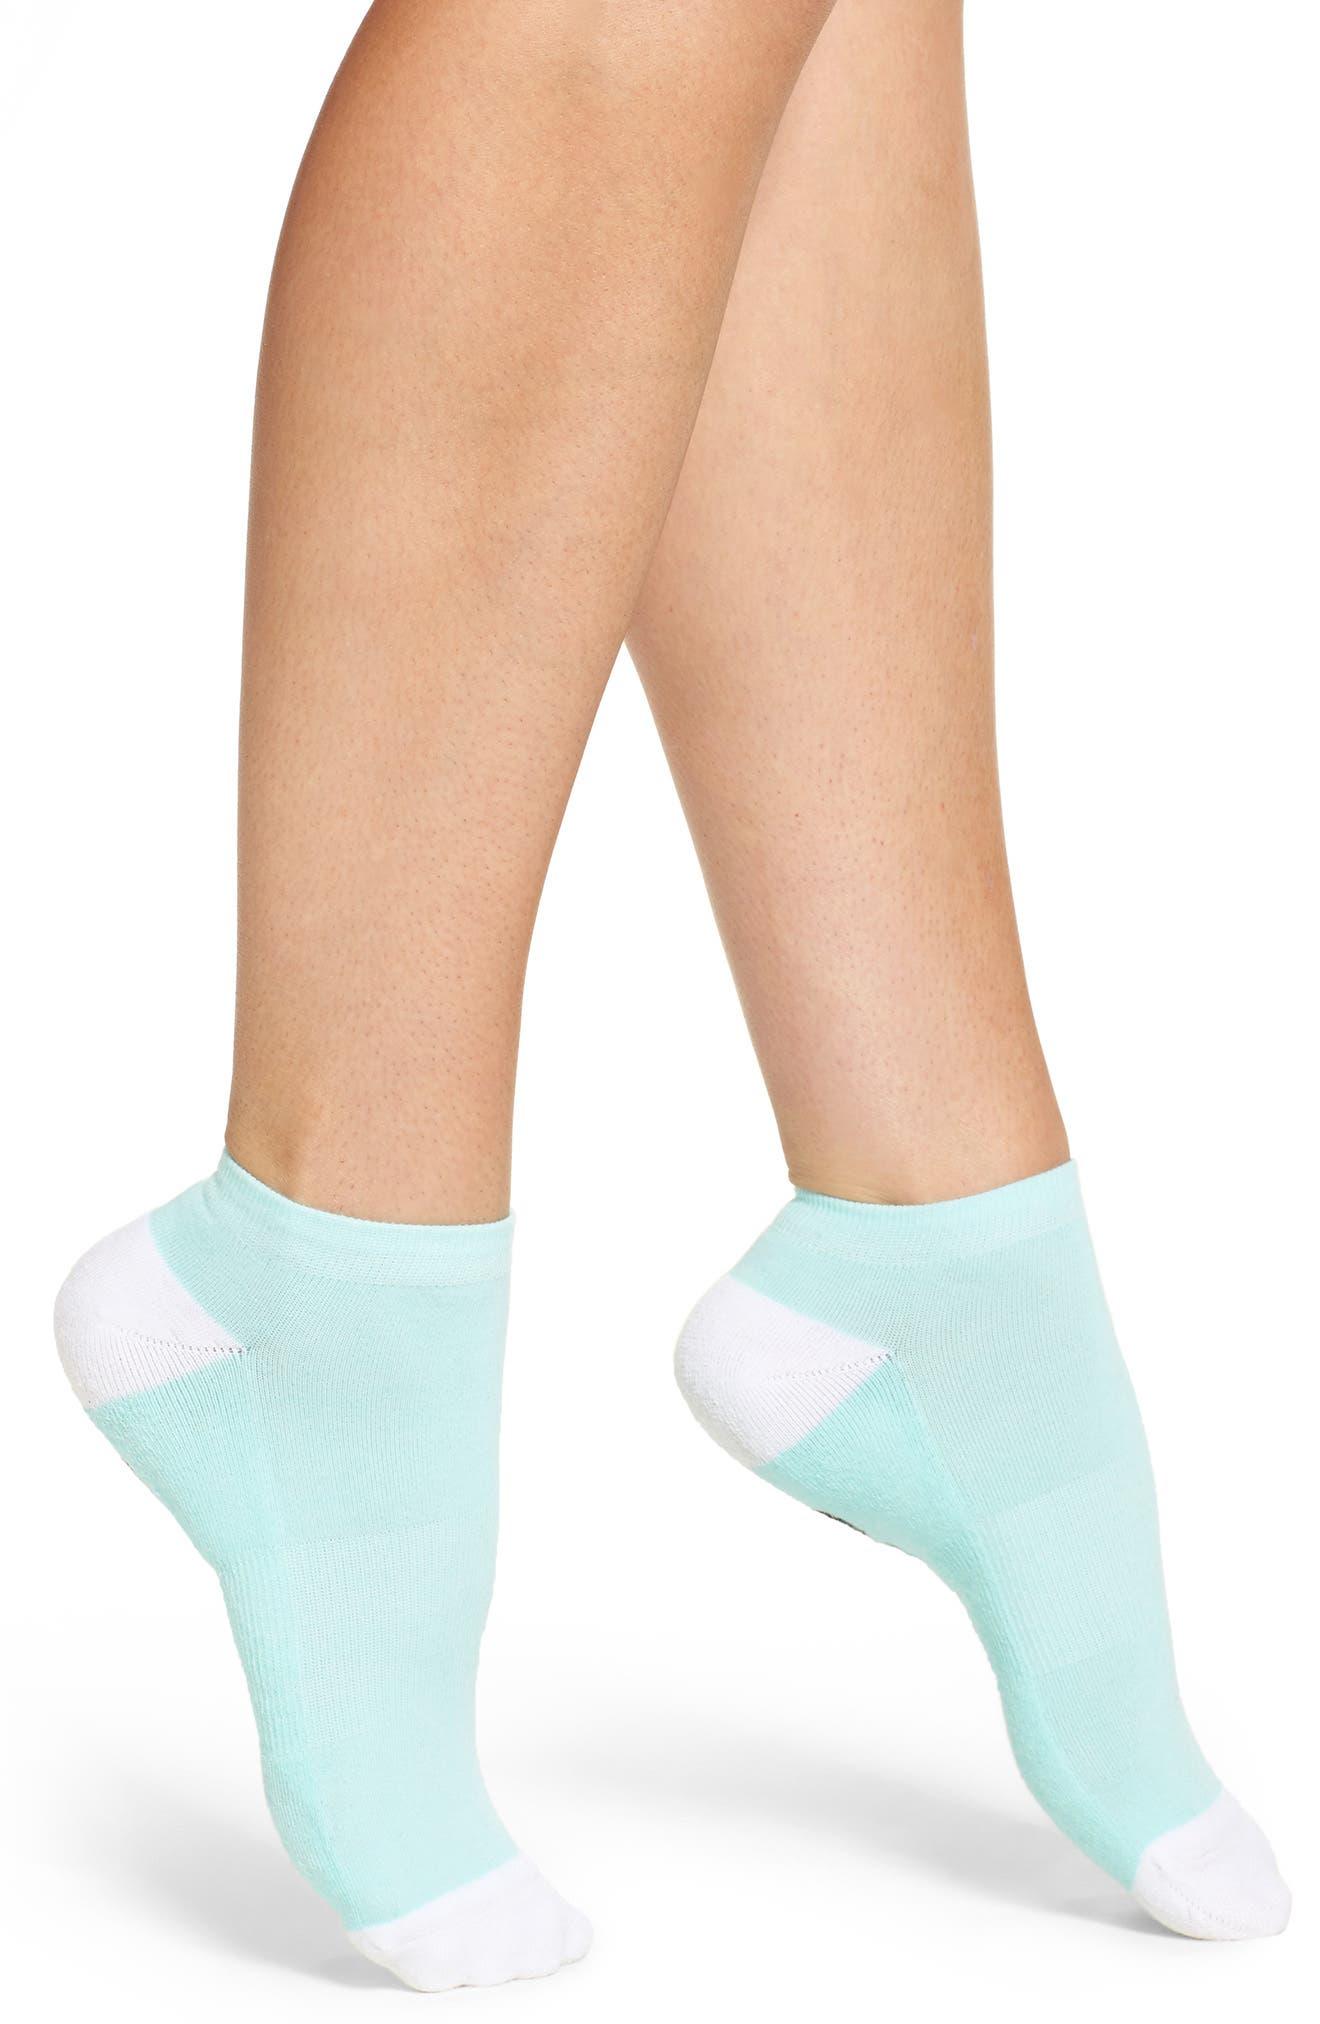 Mermaid Vibes Ankle Socks,                             Main thumbnail 1, color,                             331